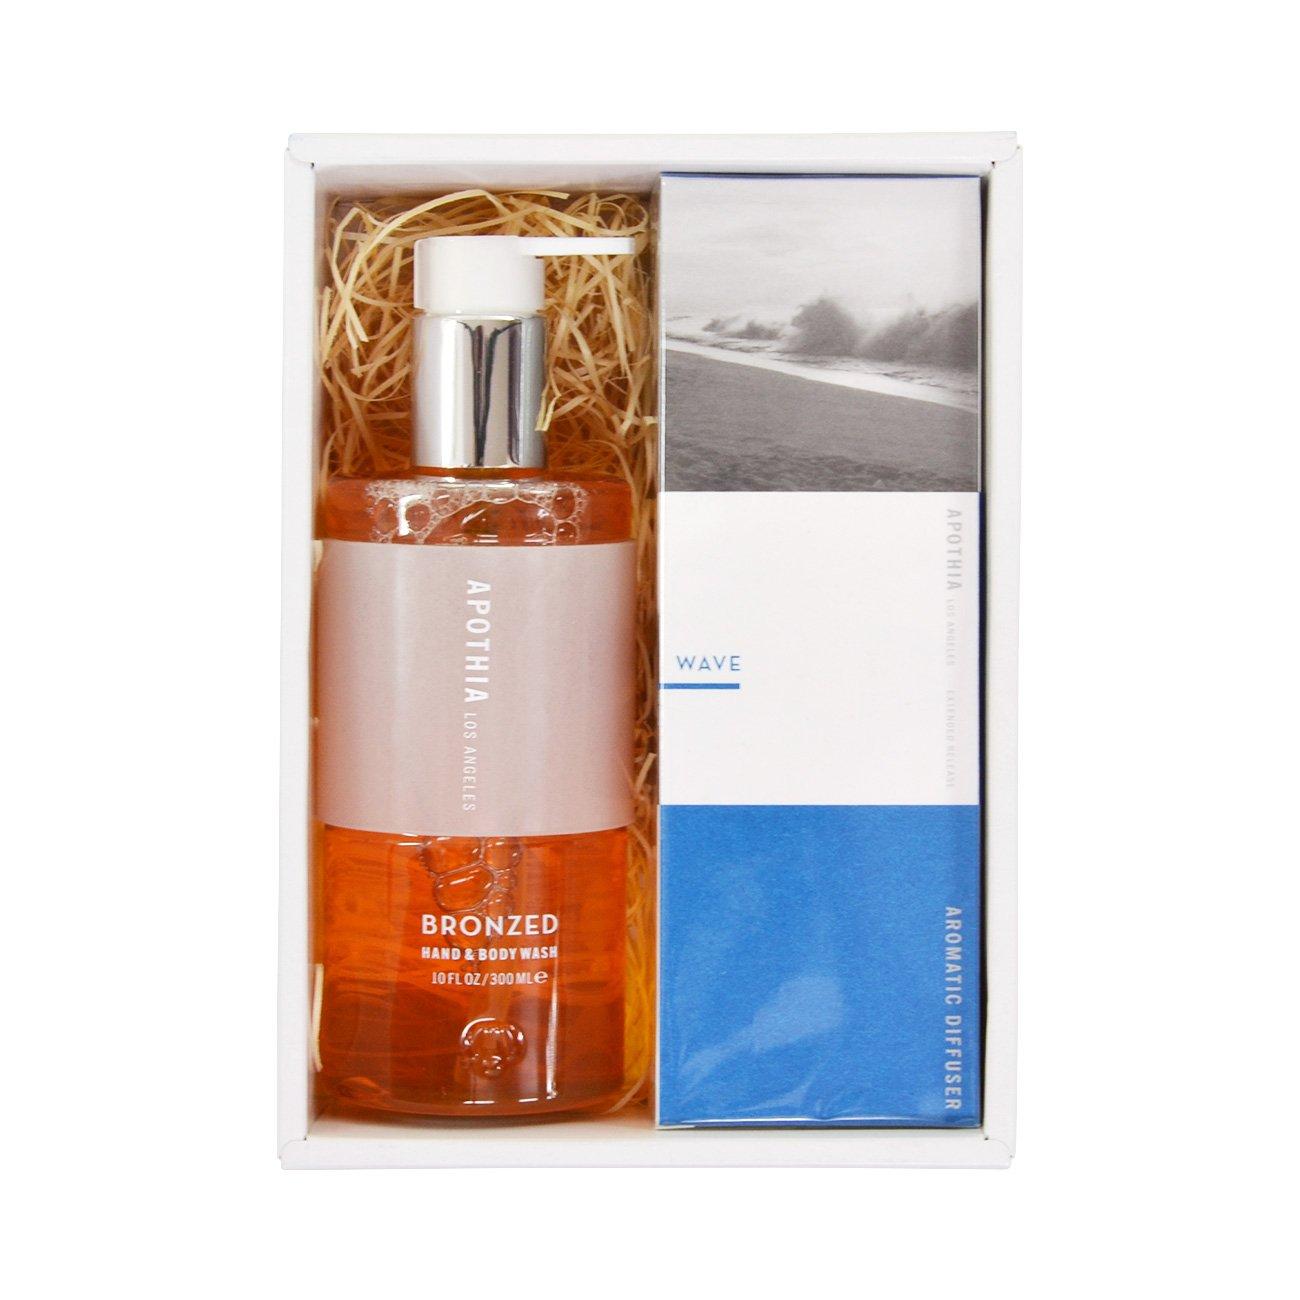 APOTHIA Diffuser mini WAVE & Hand&Body wash WAVE GIFT SET (アポーシア ディフューザーミニ ウェーブ & ハンド&ボディウォッシュ ウェーブ ギフトセット) B079P3FBDR